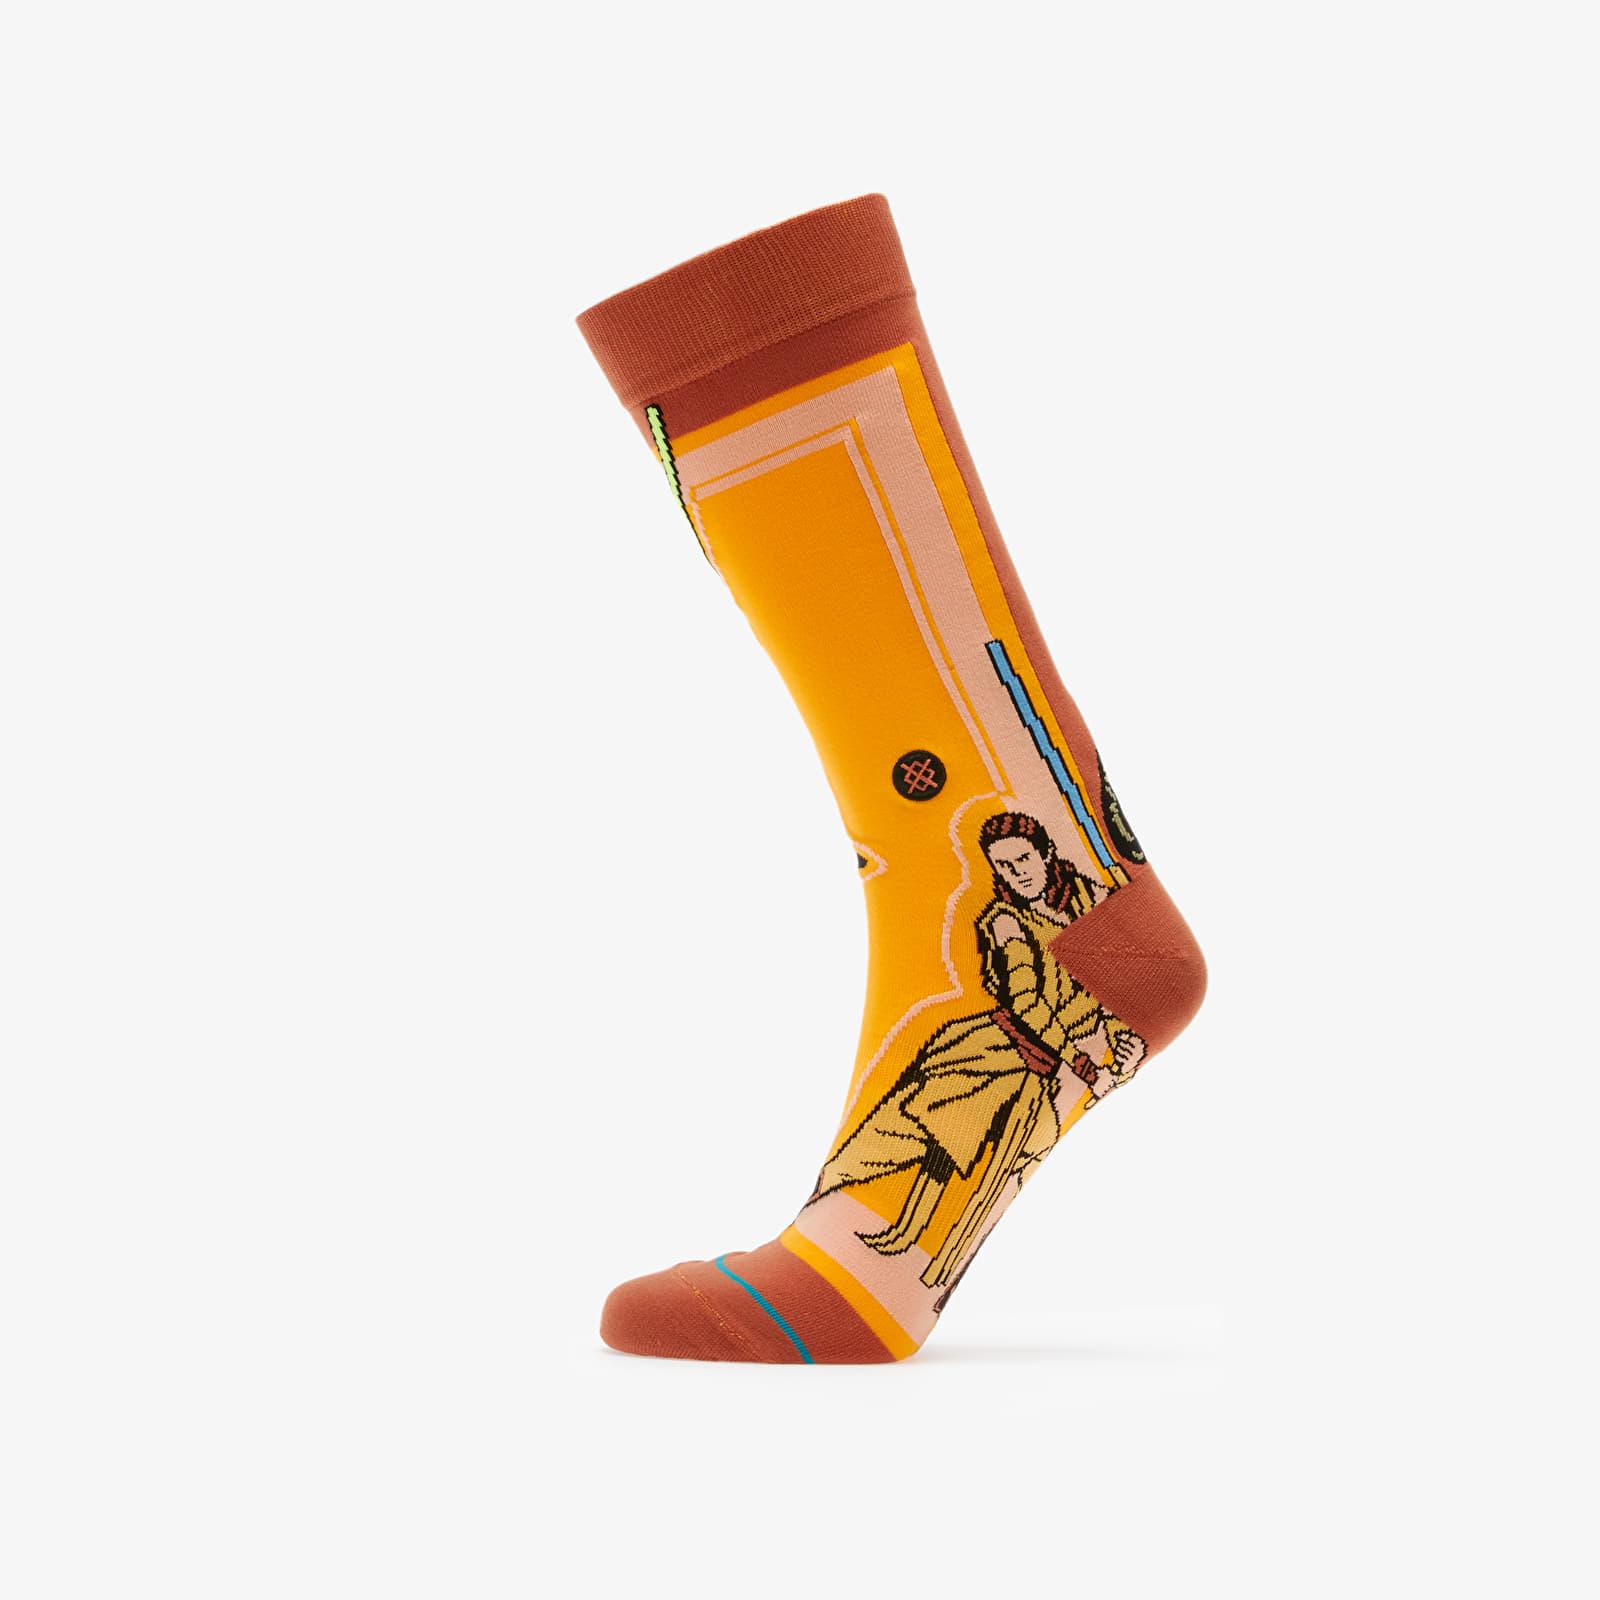 Calcetines Stance x Star Wars Jedi Socks Yellow